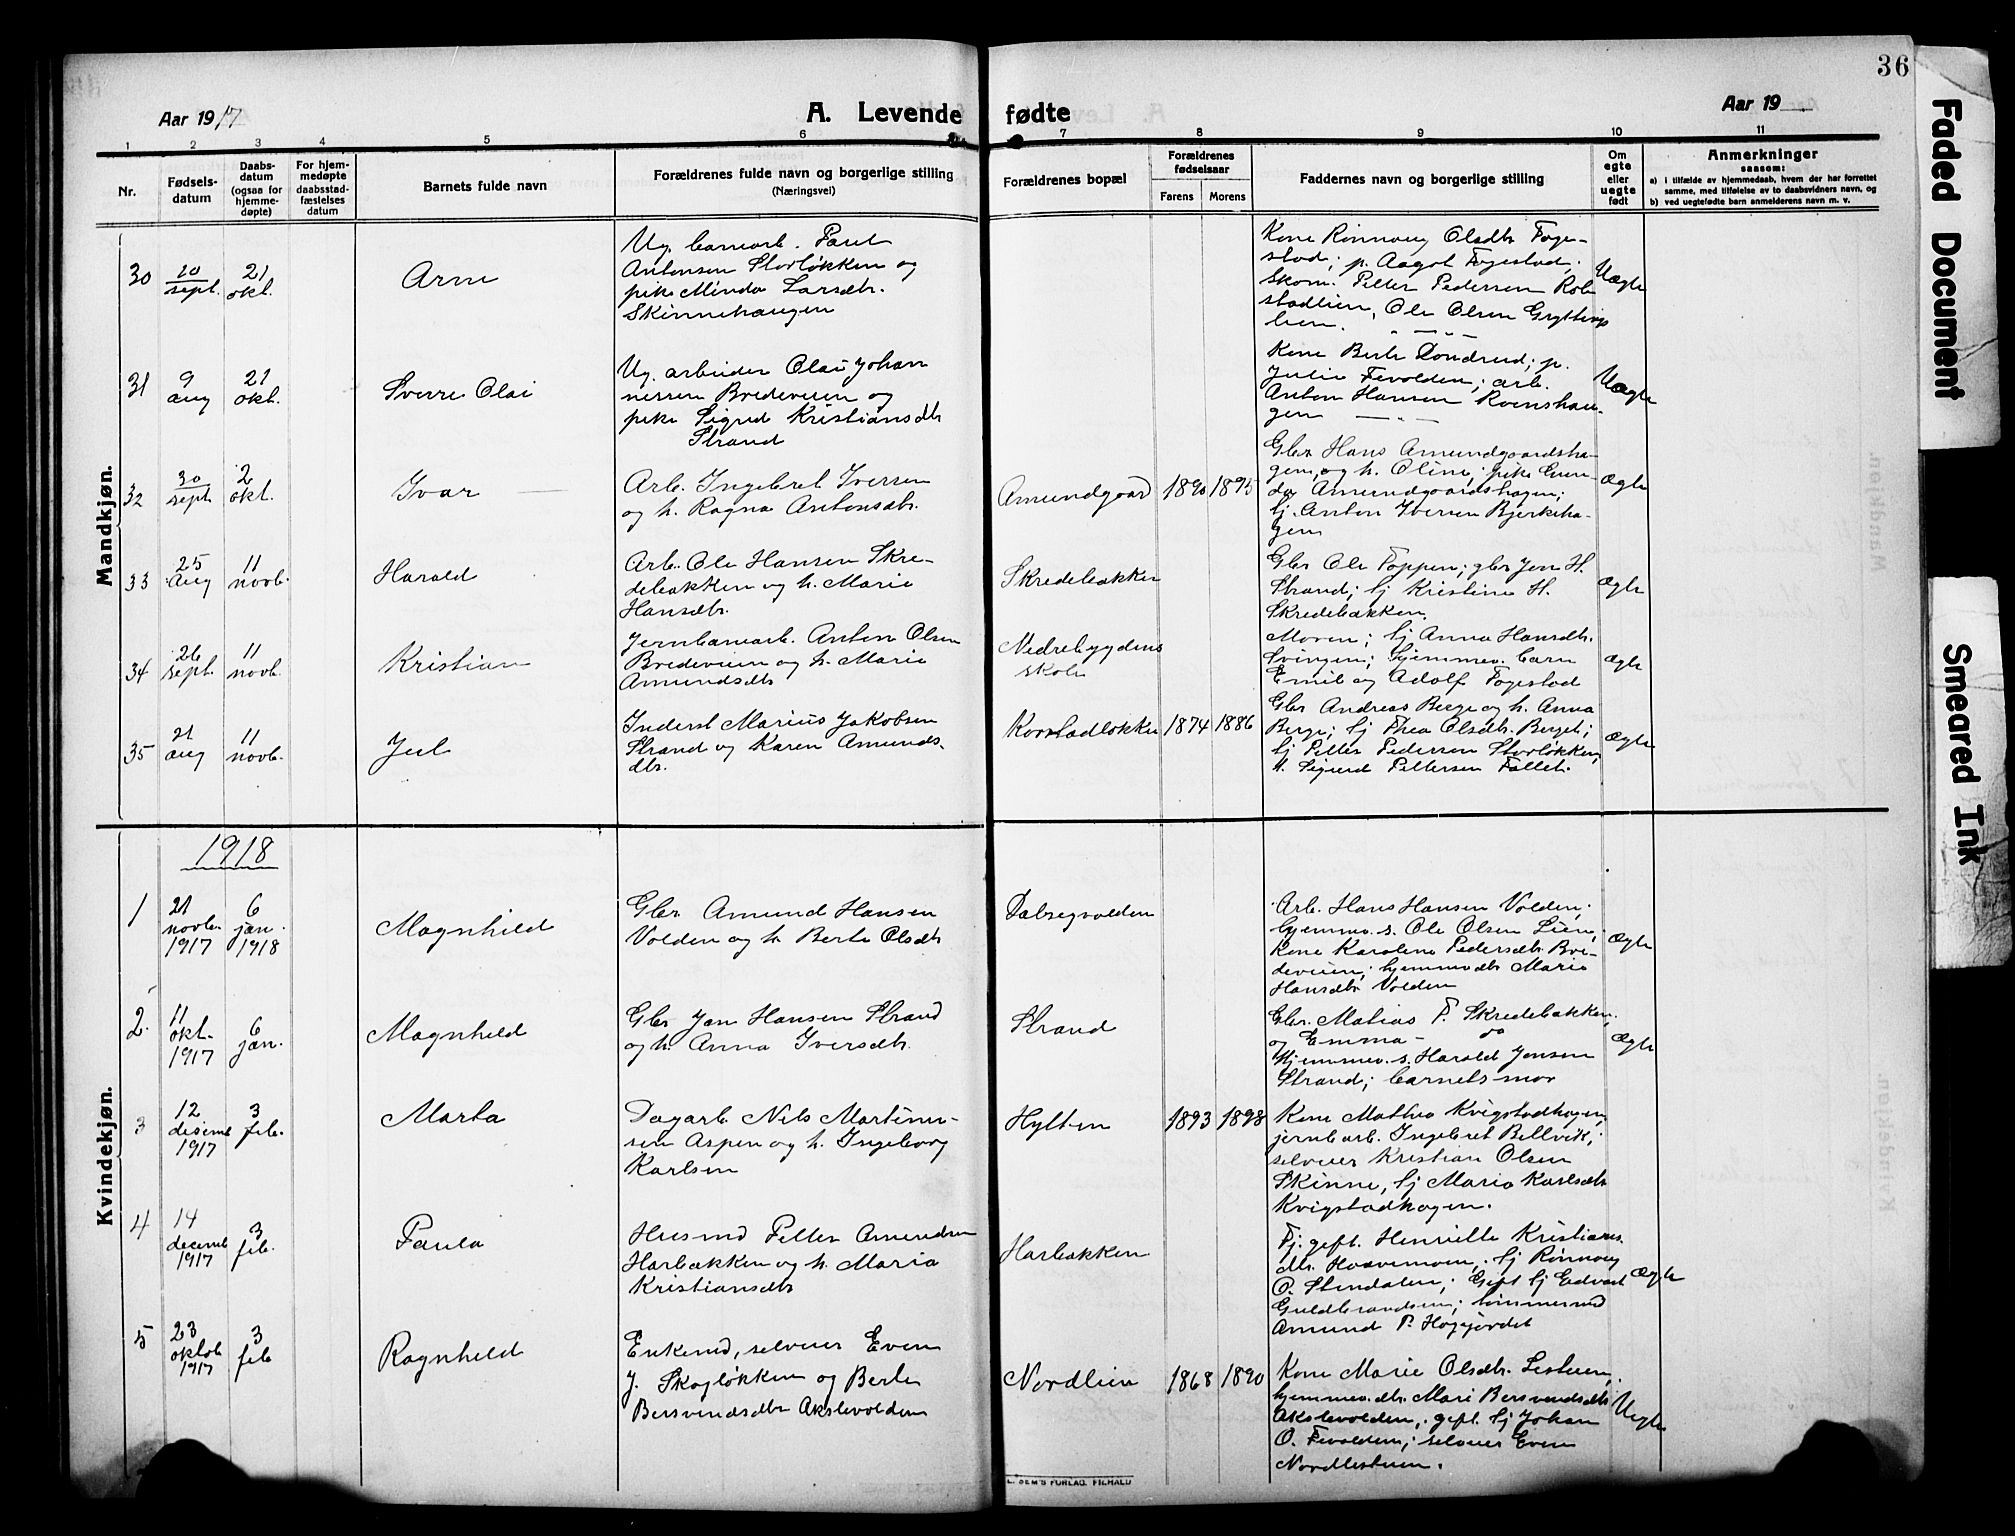 SAH, Sør-Fron prestekontor, H/Ha/Hab/L0005: Klokkerbok nr. 5, 1912-1930, s. 36